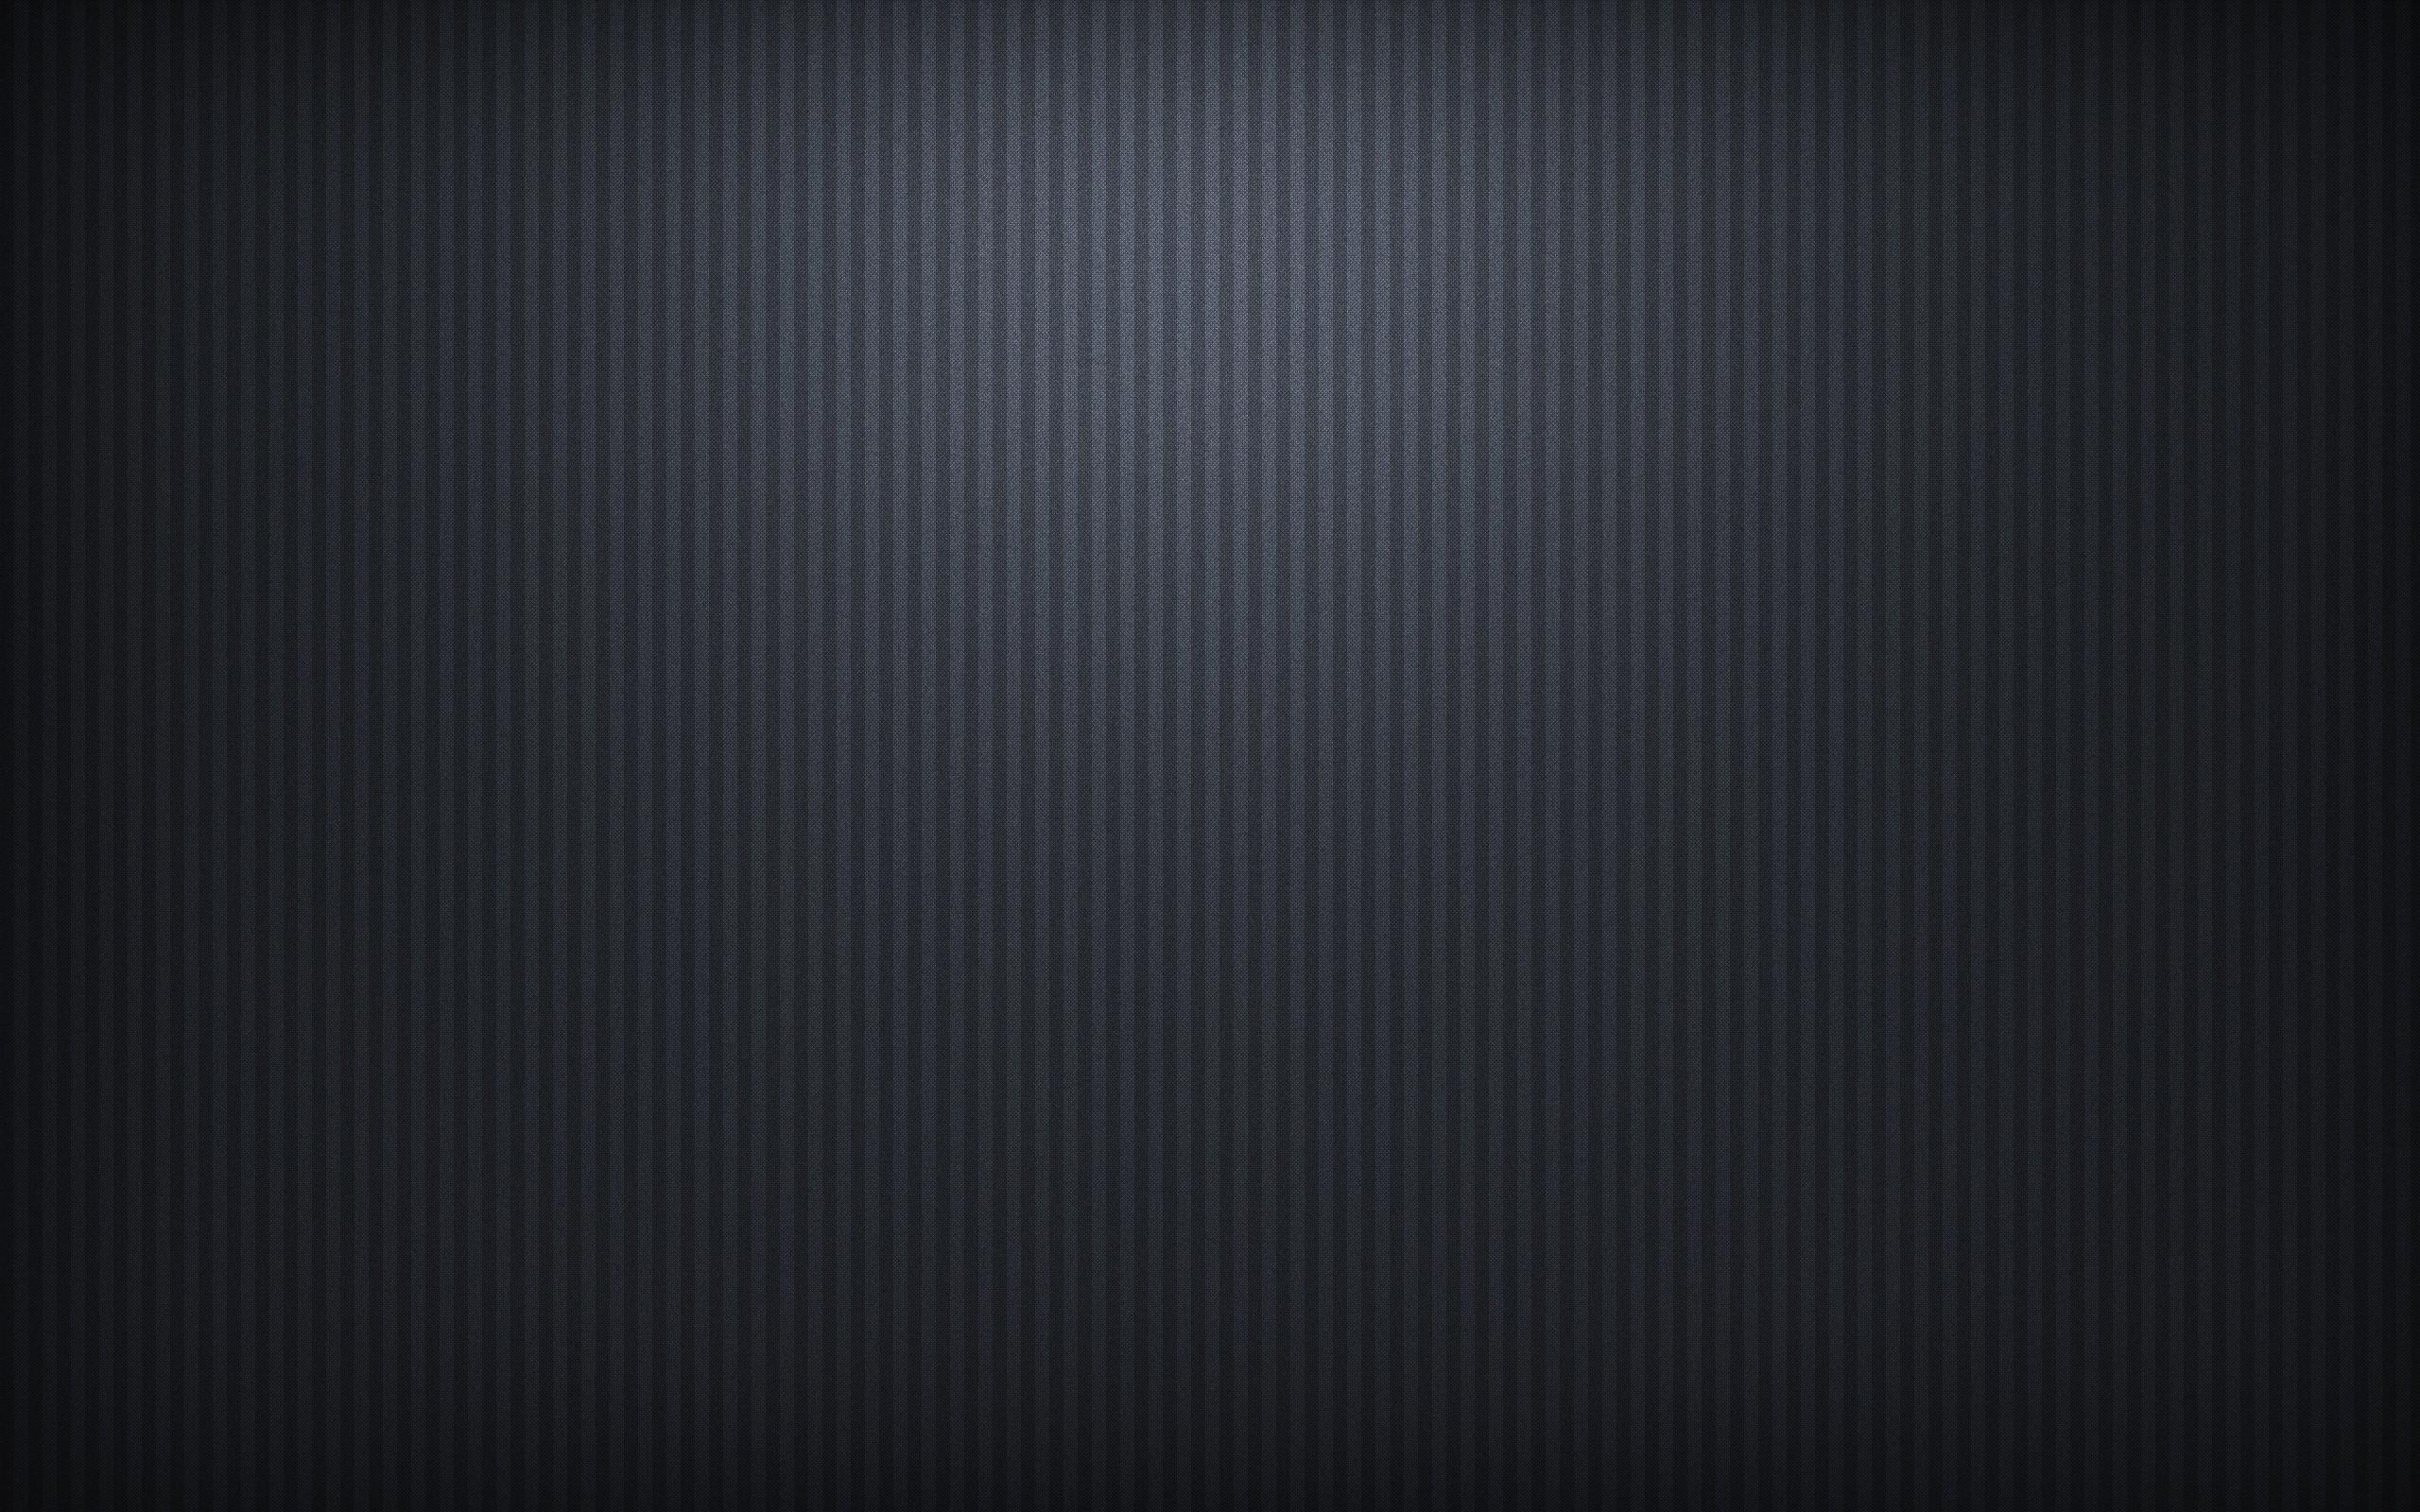 Free pattern wallpaper background